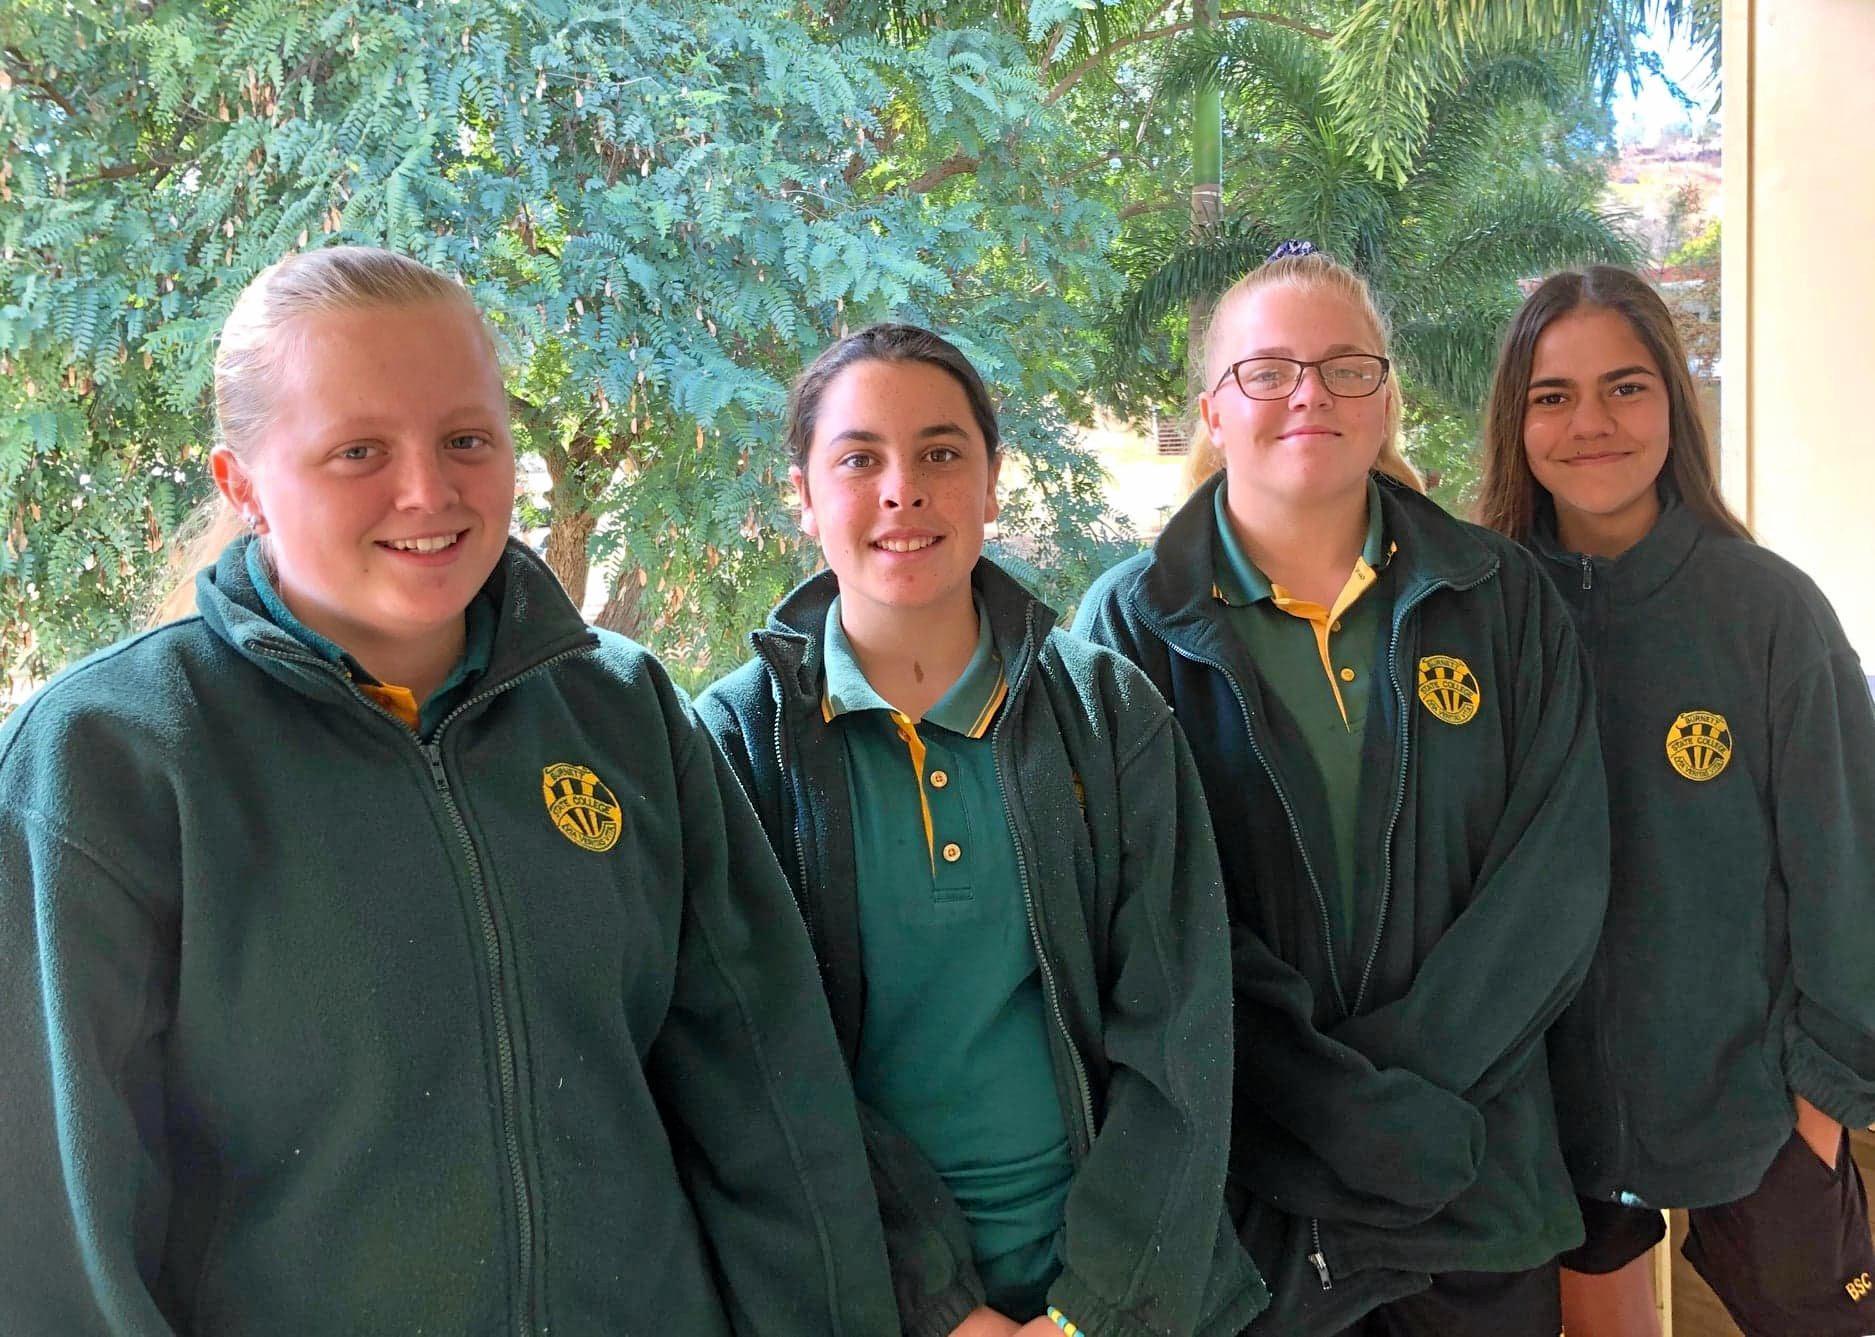 The 'Giunda Girls': Chloe George, Sara Mealand, Emily George and Makailee Appo.